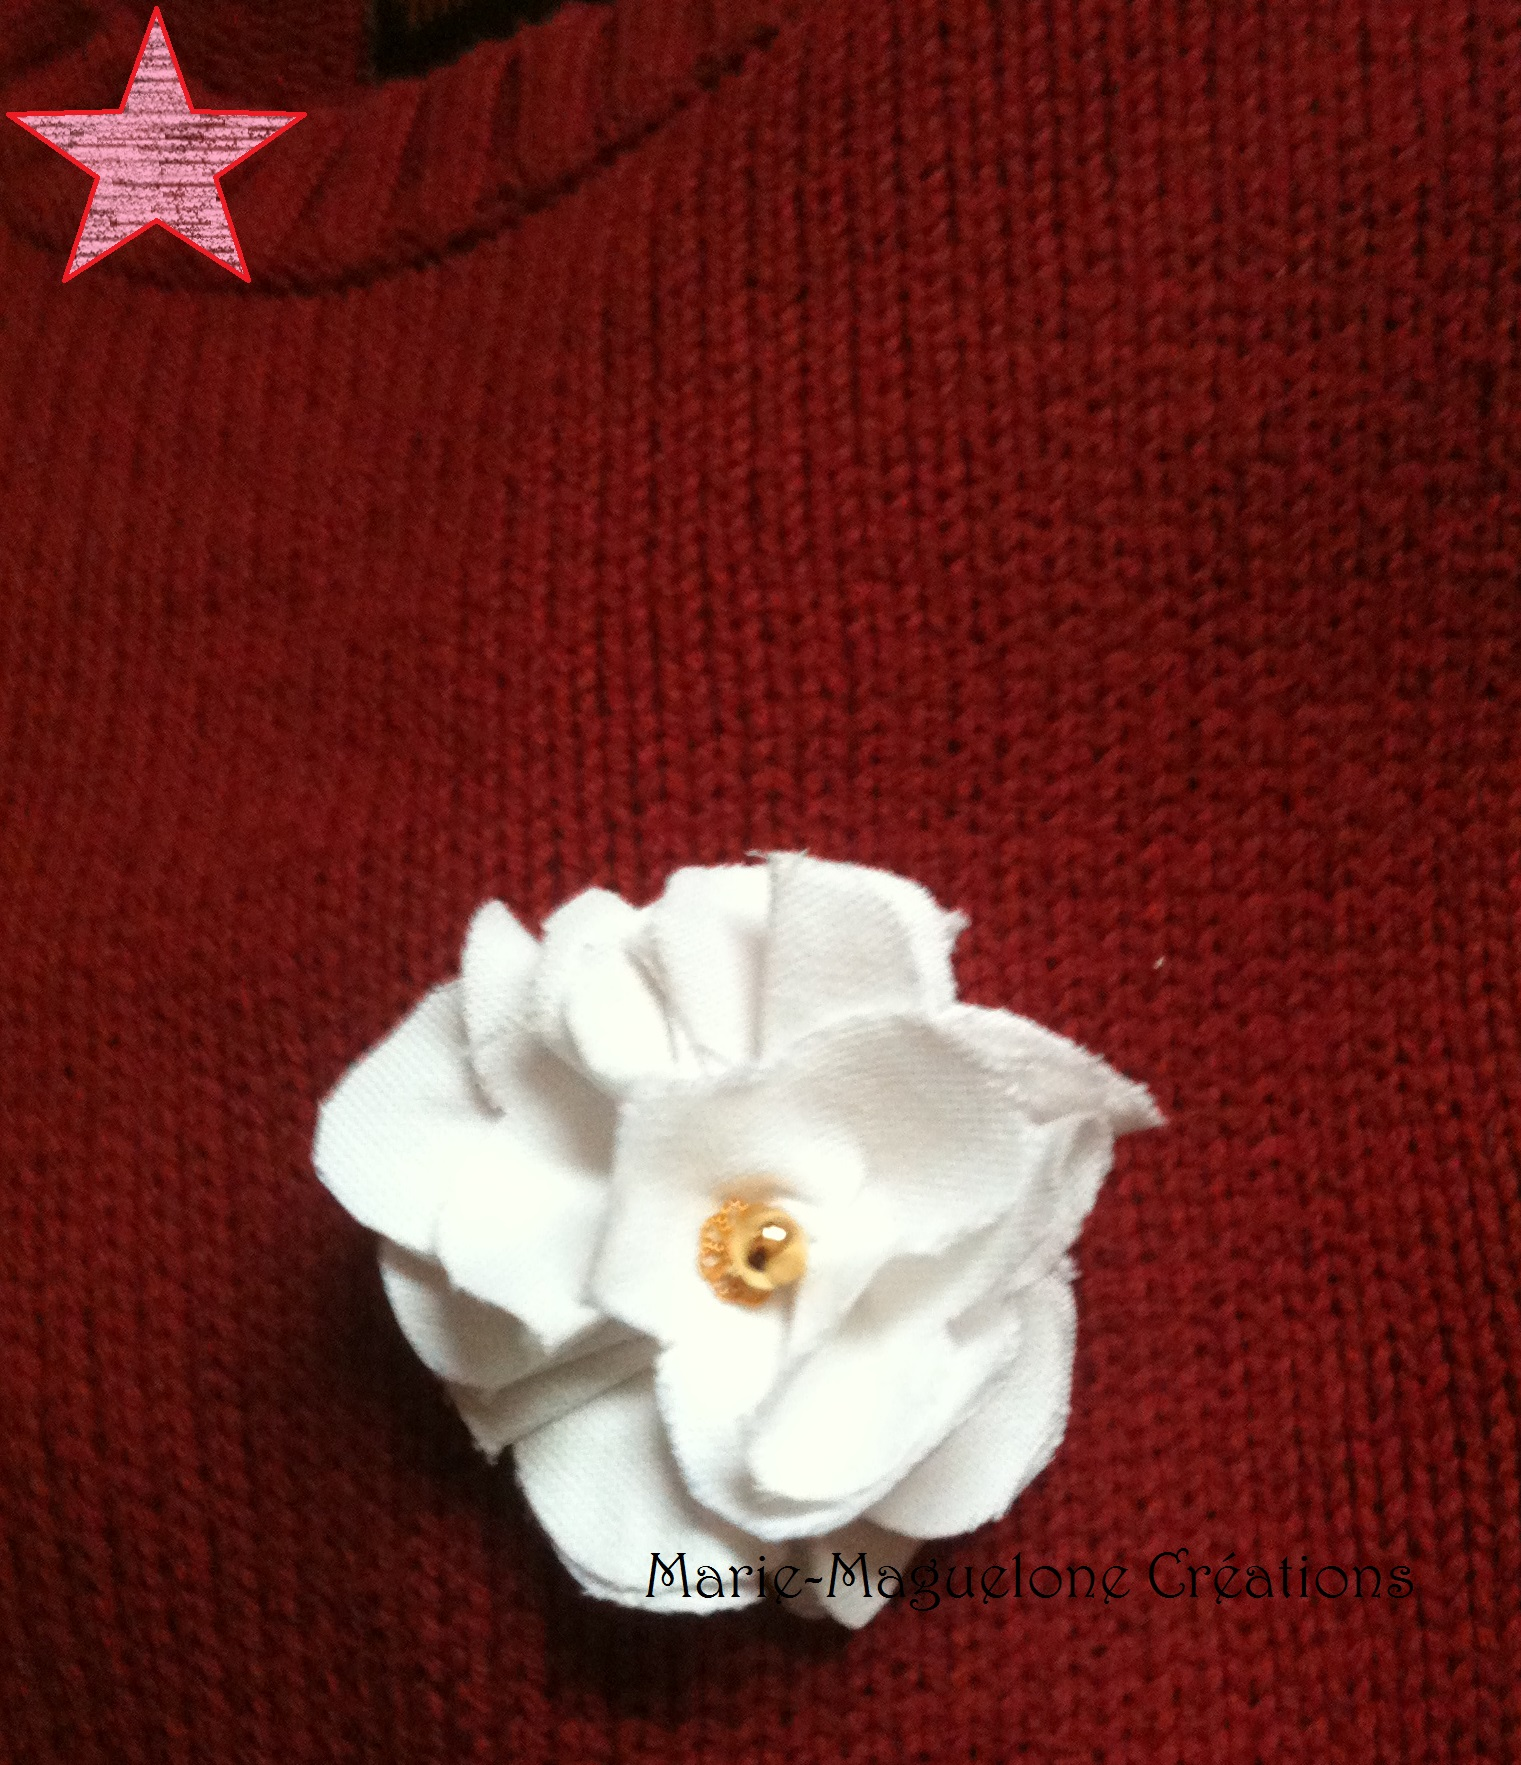 Semaine fleurie #2